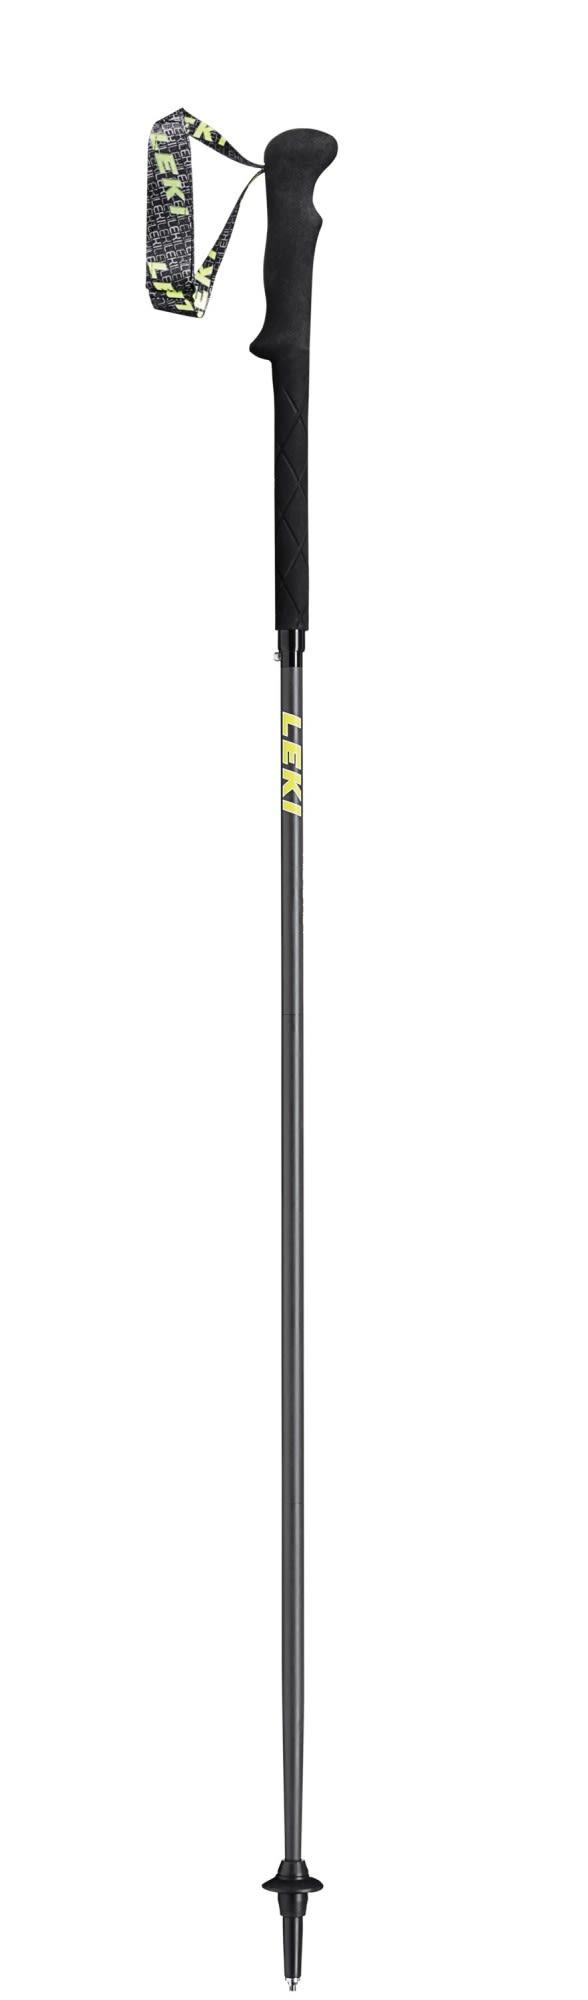 Leki Micro RCM Gelb, Wander-& Trekkingstock, 135 cm